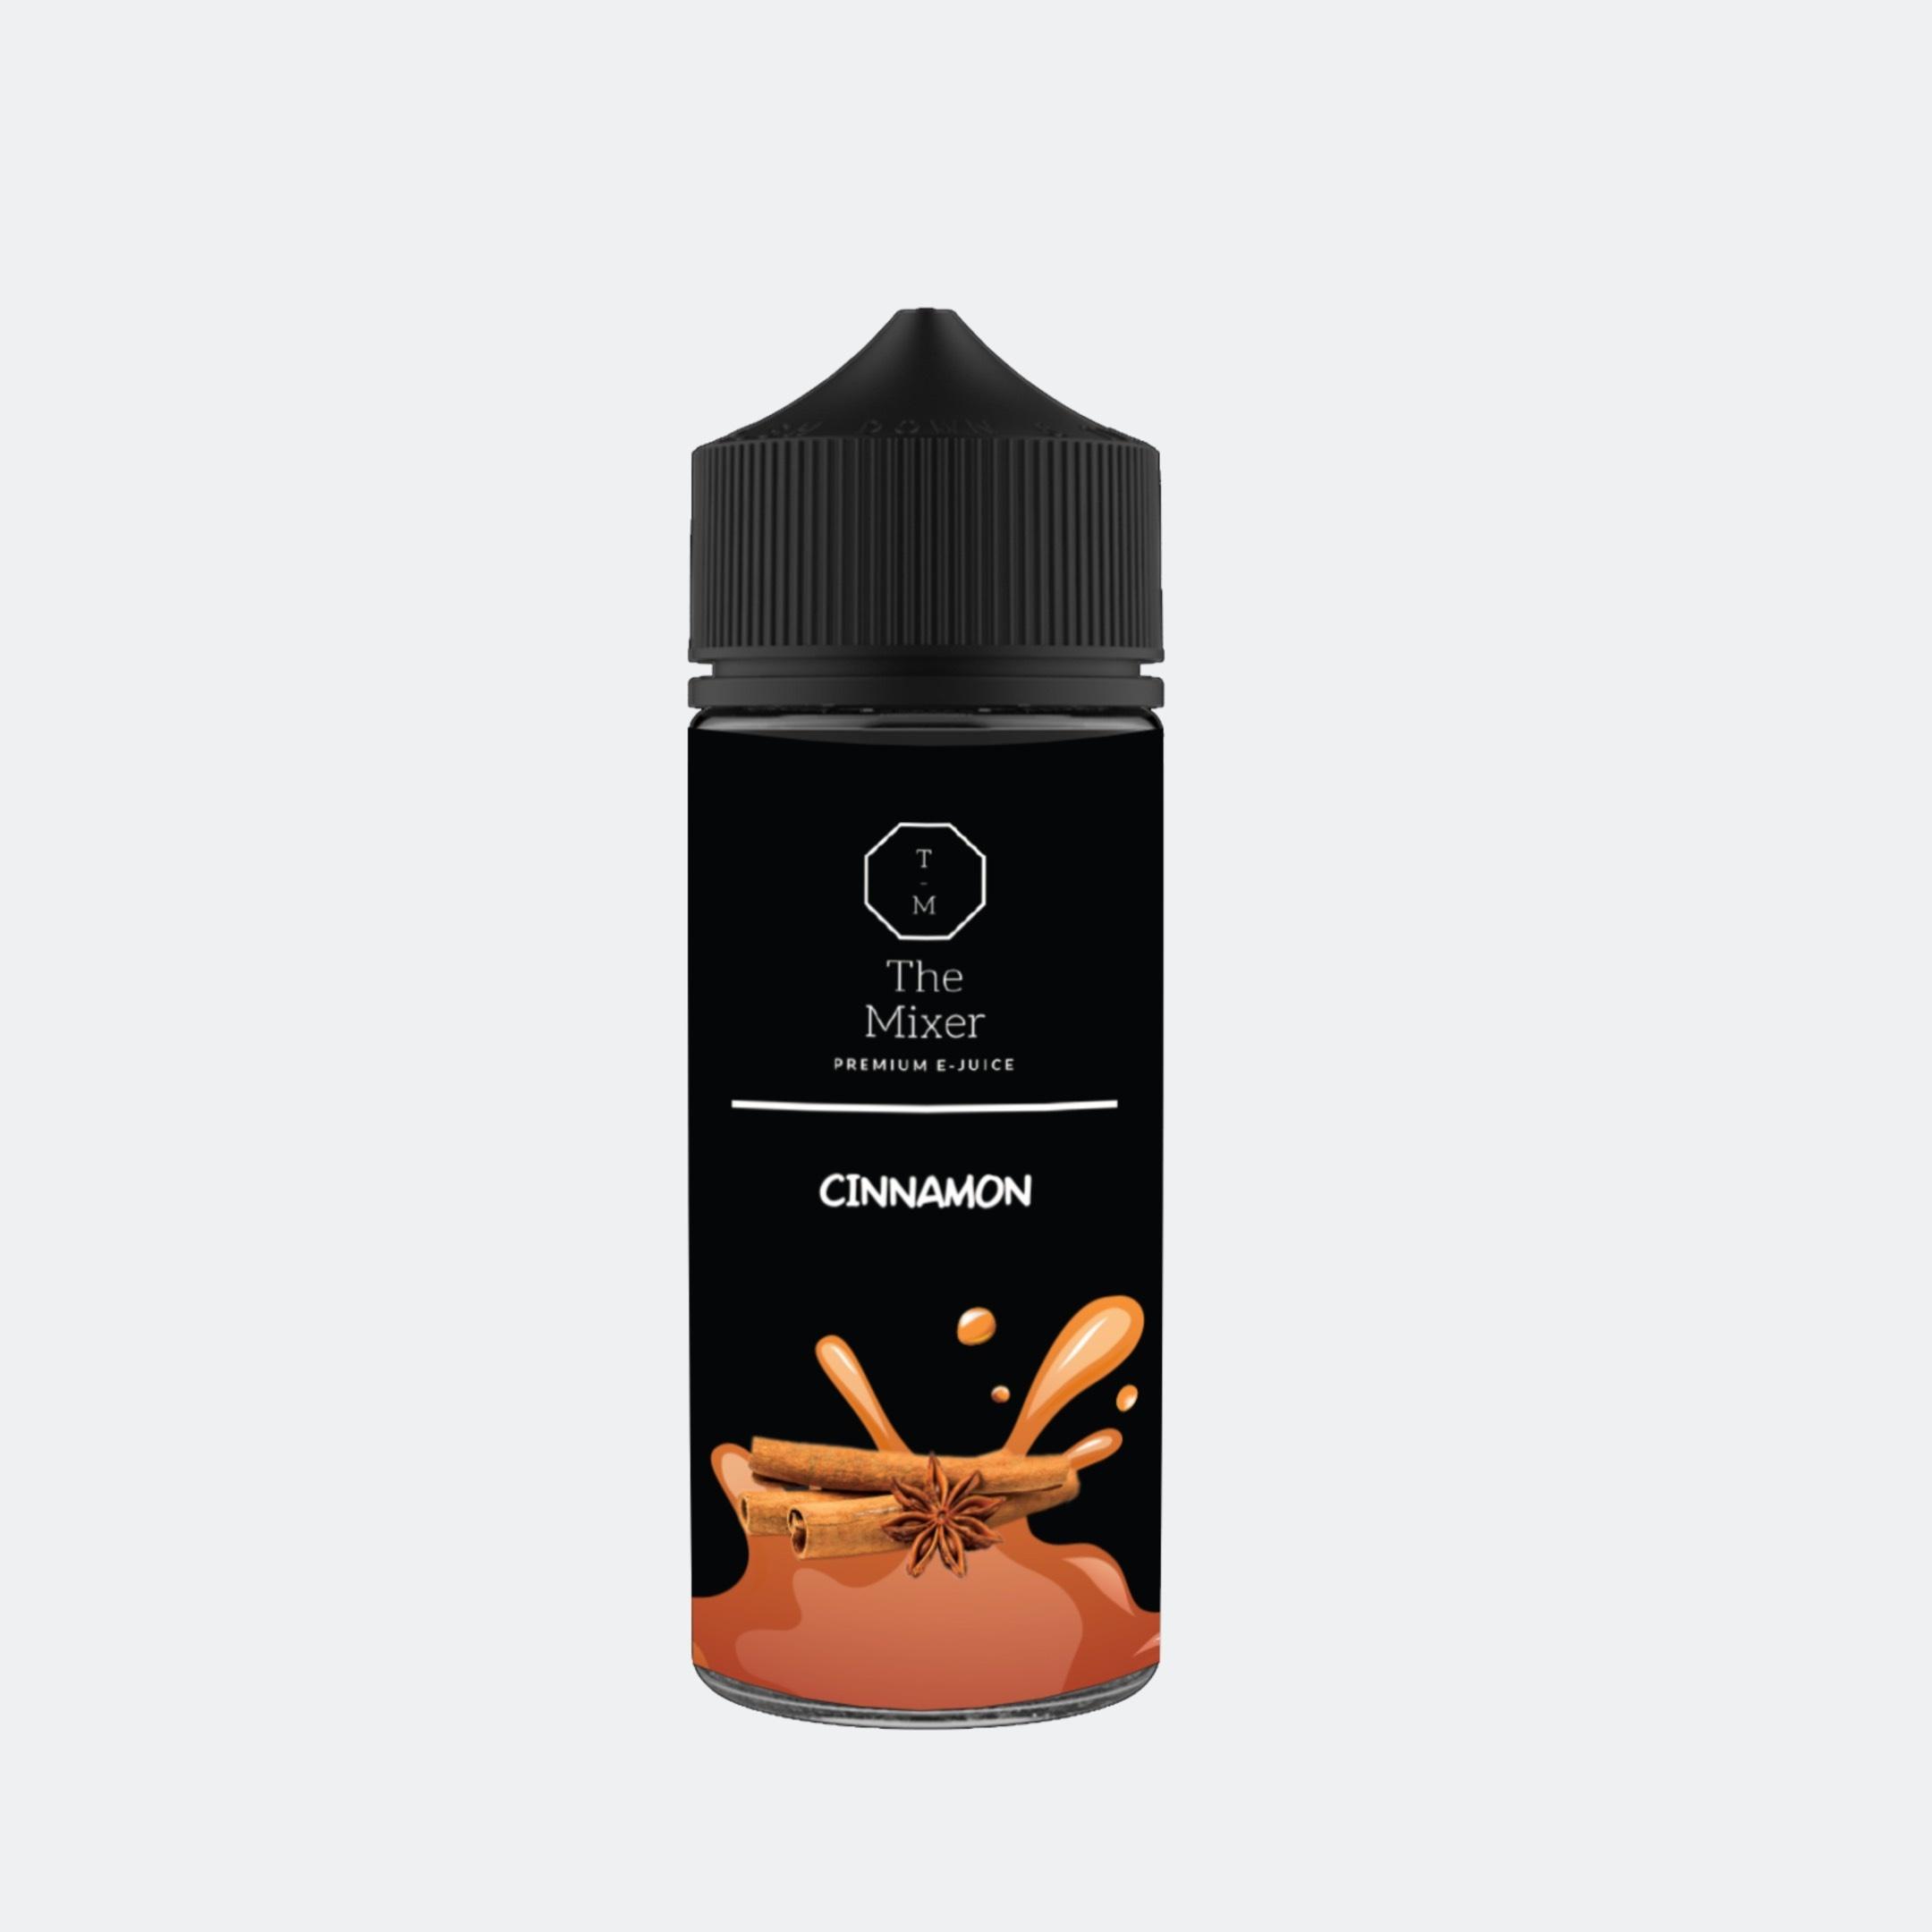 The Mixer Cinnamon